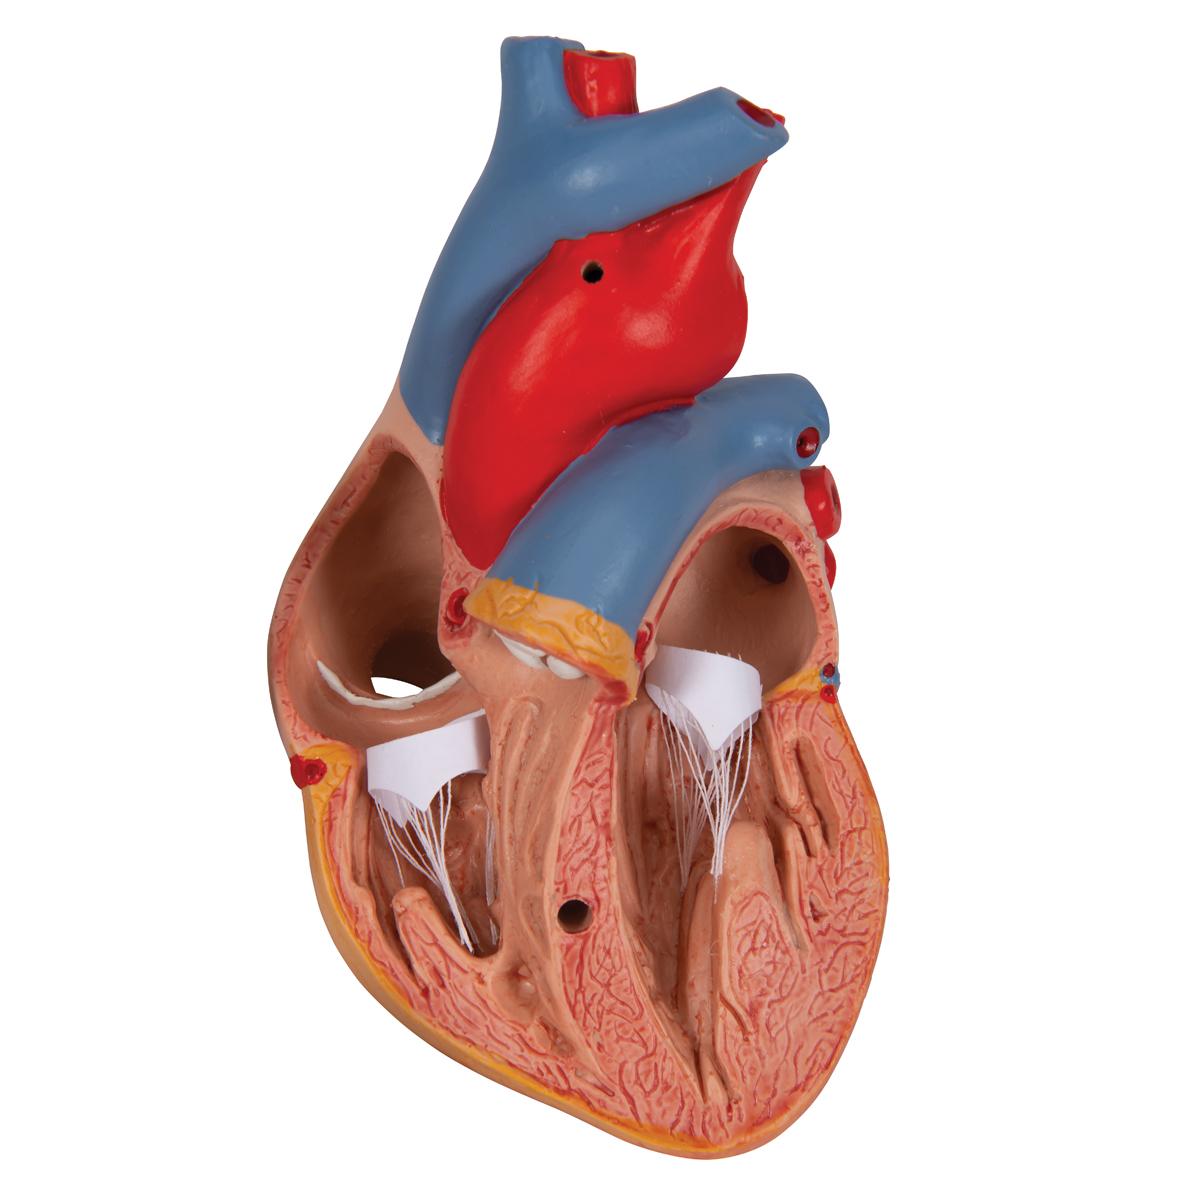 Anatomical Heart Model Anatomy Of The Heart Classic Heart Model